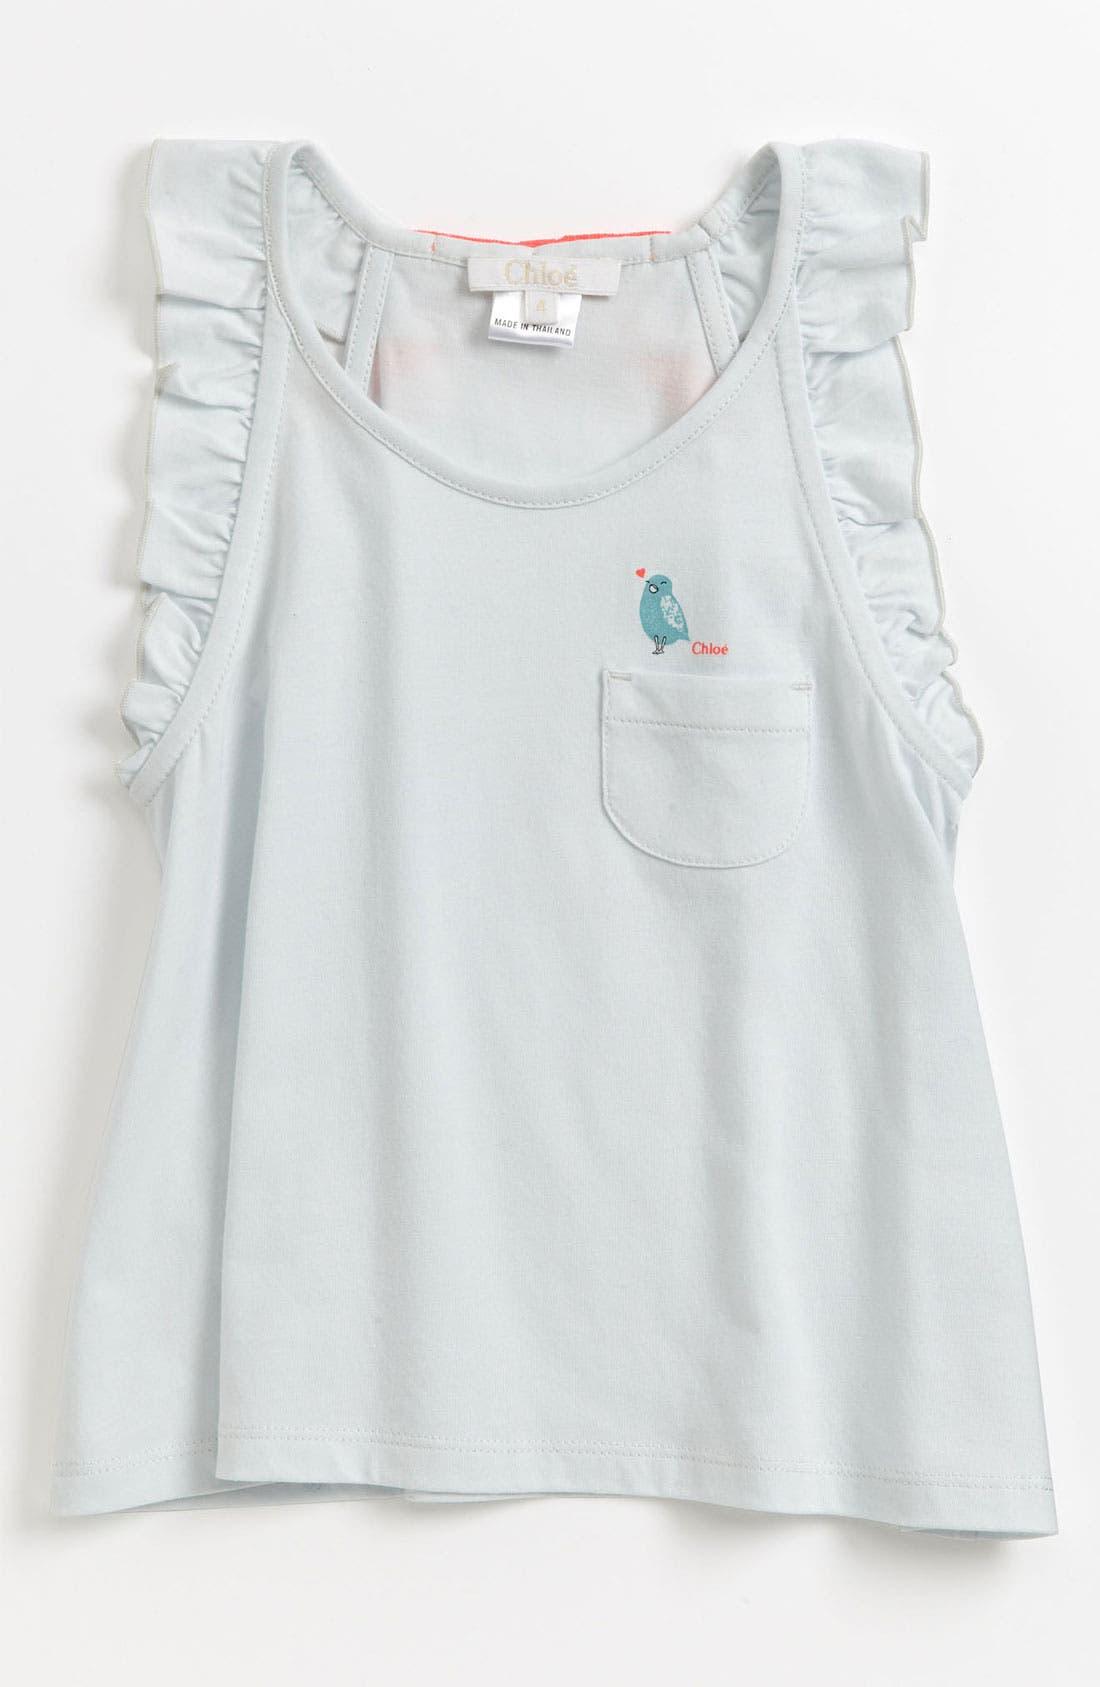 Main Image - Chloé Ruffle Sleeve Tank Top (Toddler, Little Girls & Big Girls)